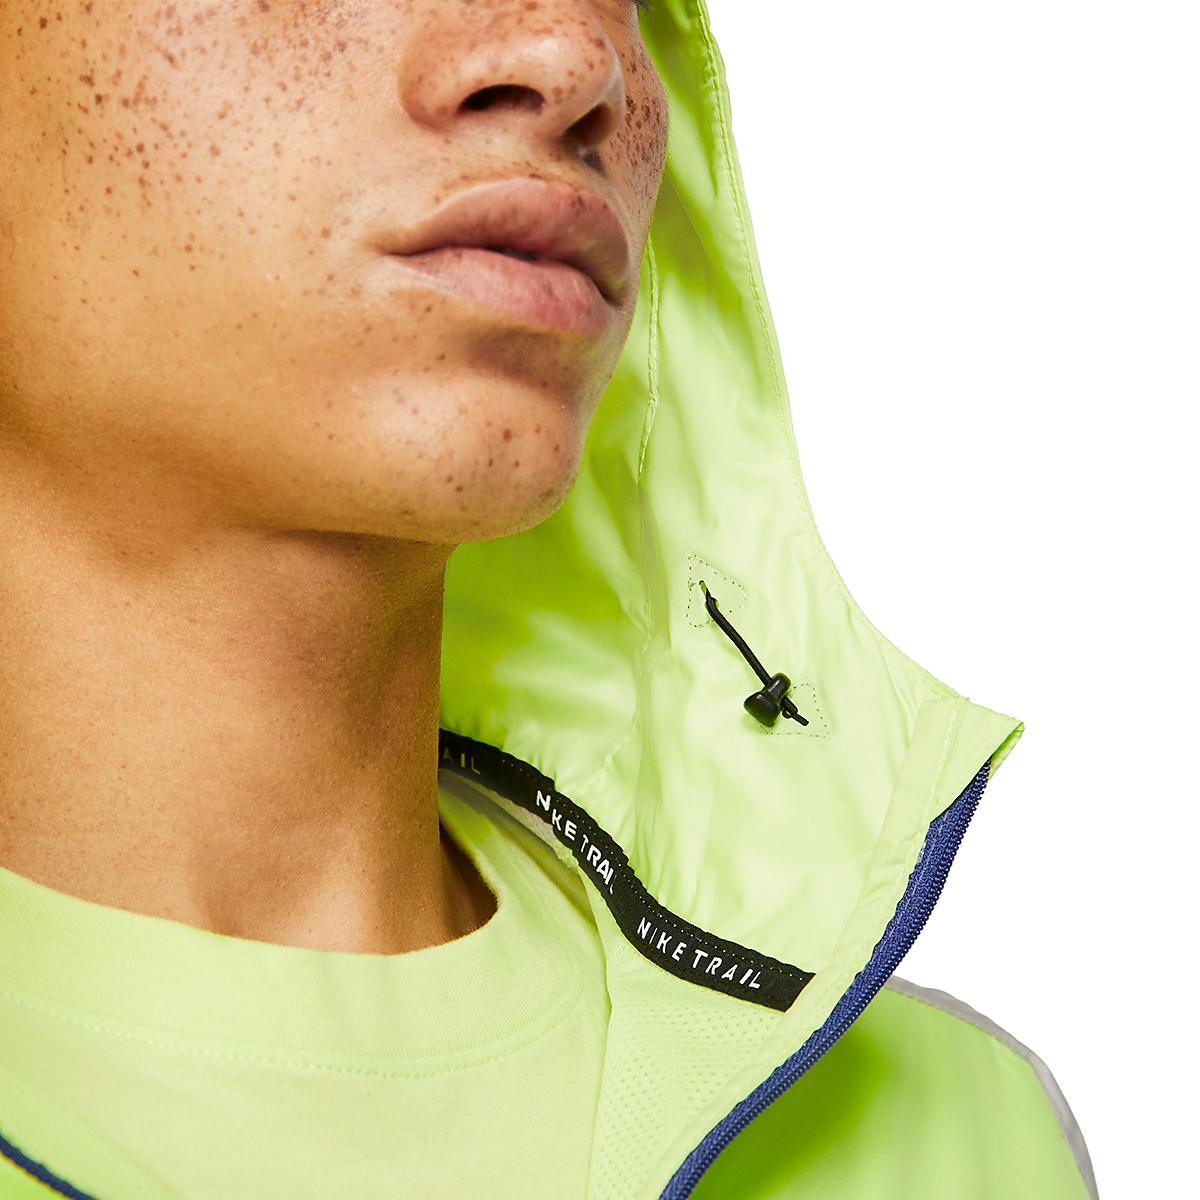 Men's Nike Windrunner Trail Running Jacket - Color: Light Lemon Twist/Moon Fossil/Bright Spruce - Size: S, Light Lemon Twist/Moon Fossil/Bright Spruce, large, image 4